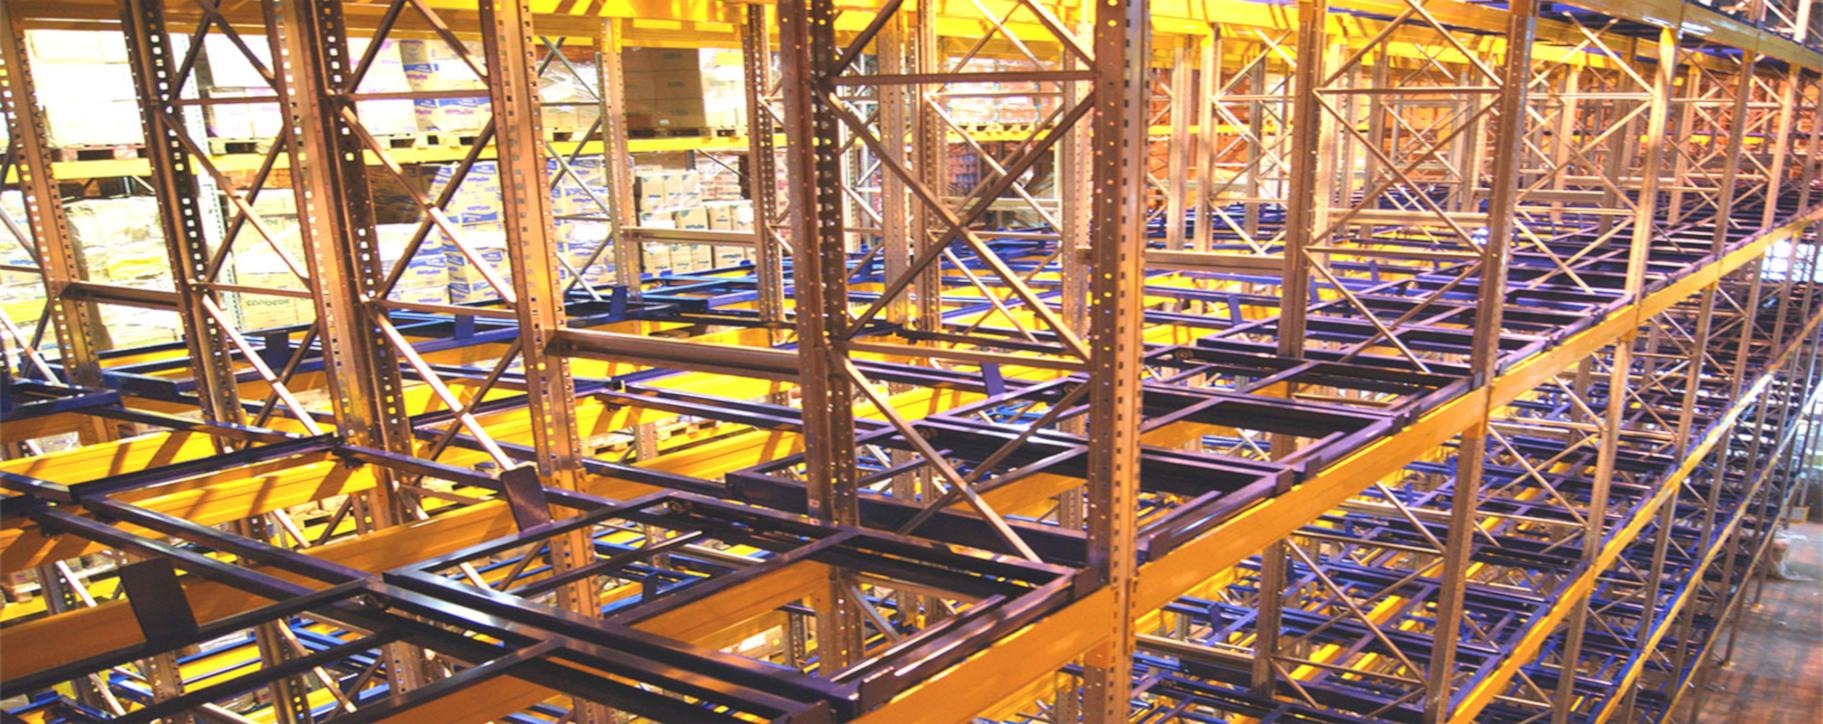 Rafturi Push Back pentru depozitare tunelizata in varianta FILO